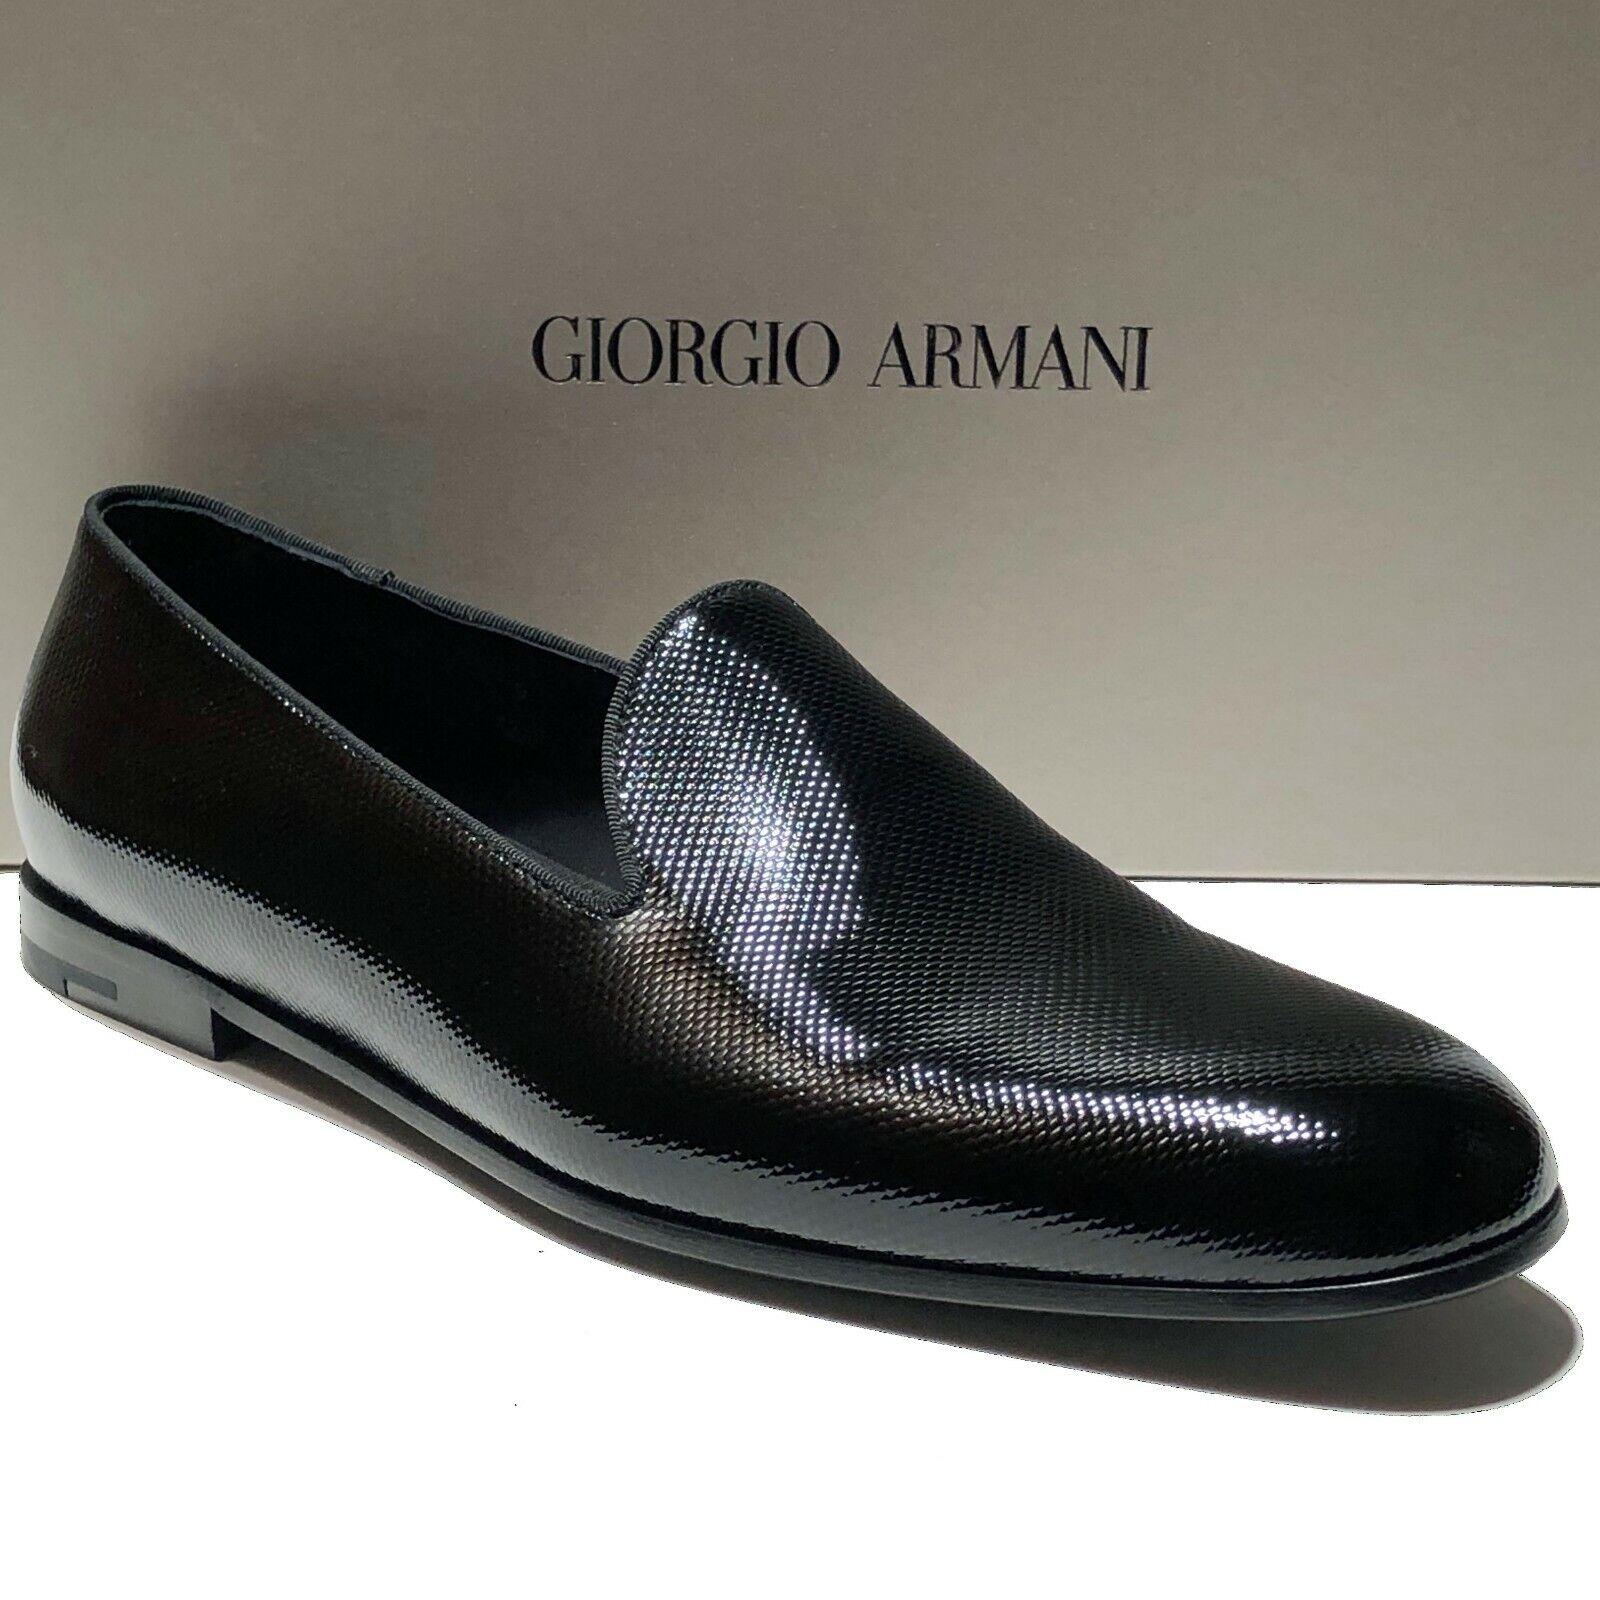 Armani nero Leather Fashion Men's Loafers Dress scarpe 8.5 Formal Tuxedo Casual